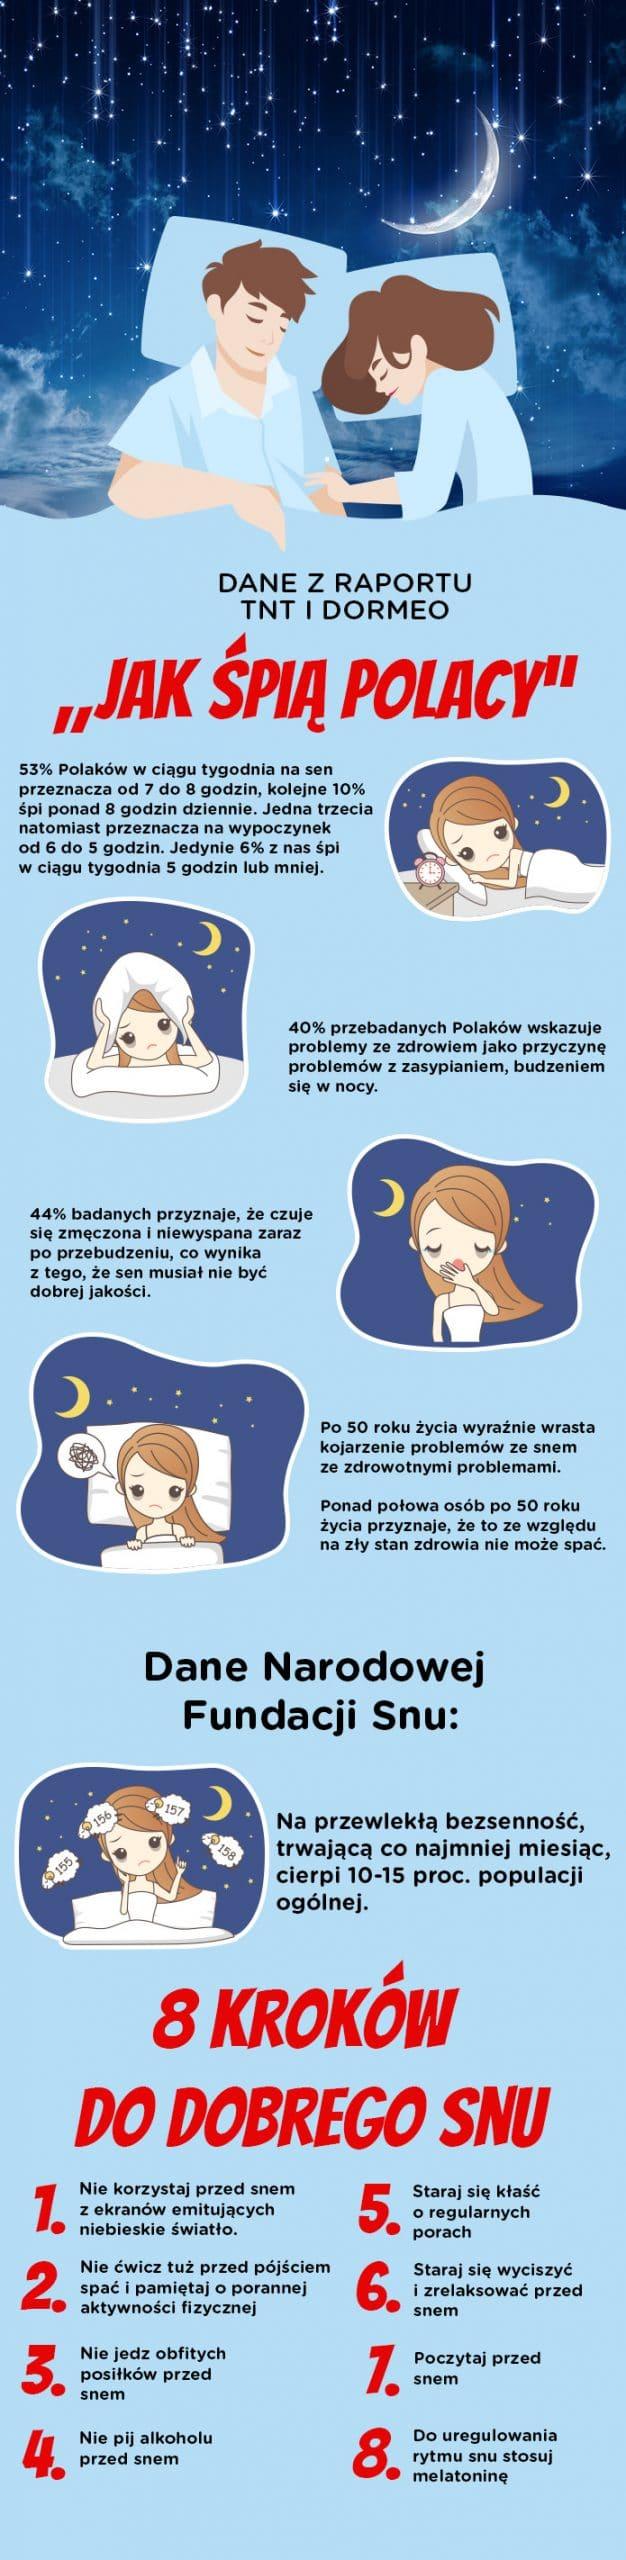 Jak śpią Polacy?